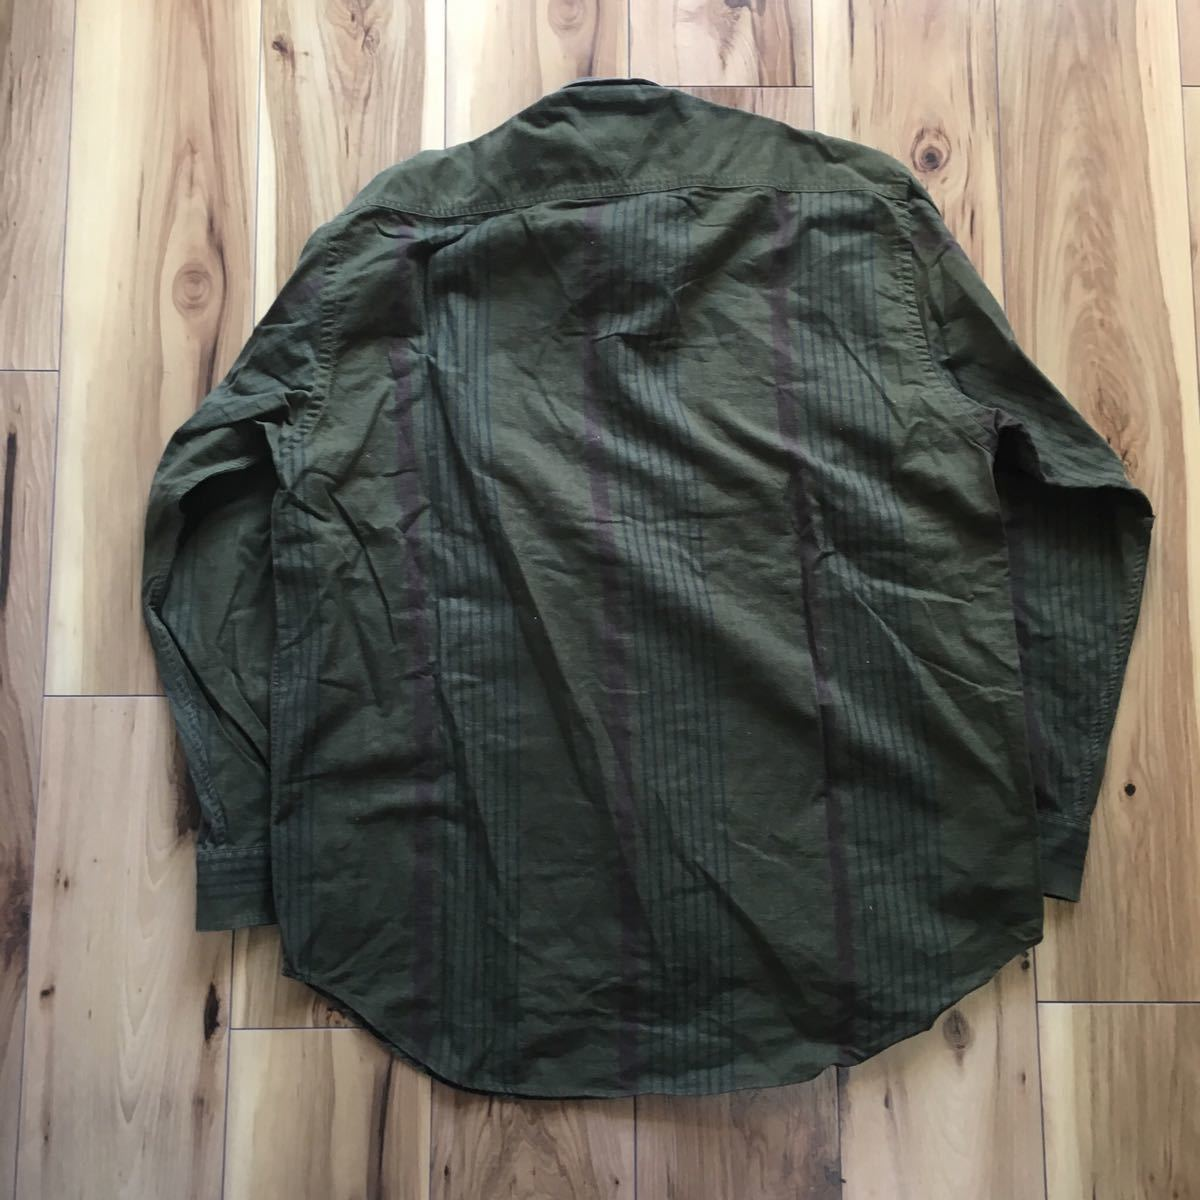 90s TOMMY HILFIGER 長袖シャツ メンズ 実寸 XL程度 カーキ トミーヒルフィガー BDシャツ ヴィンテージ ビンテージ 古着 ビッグサイズ B316_画像3